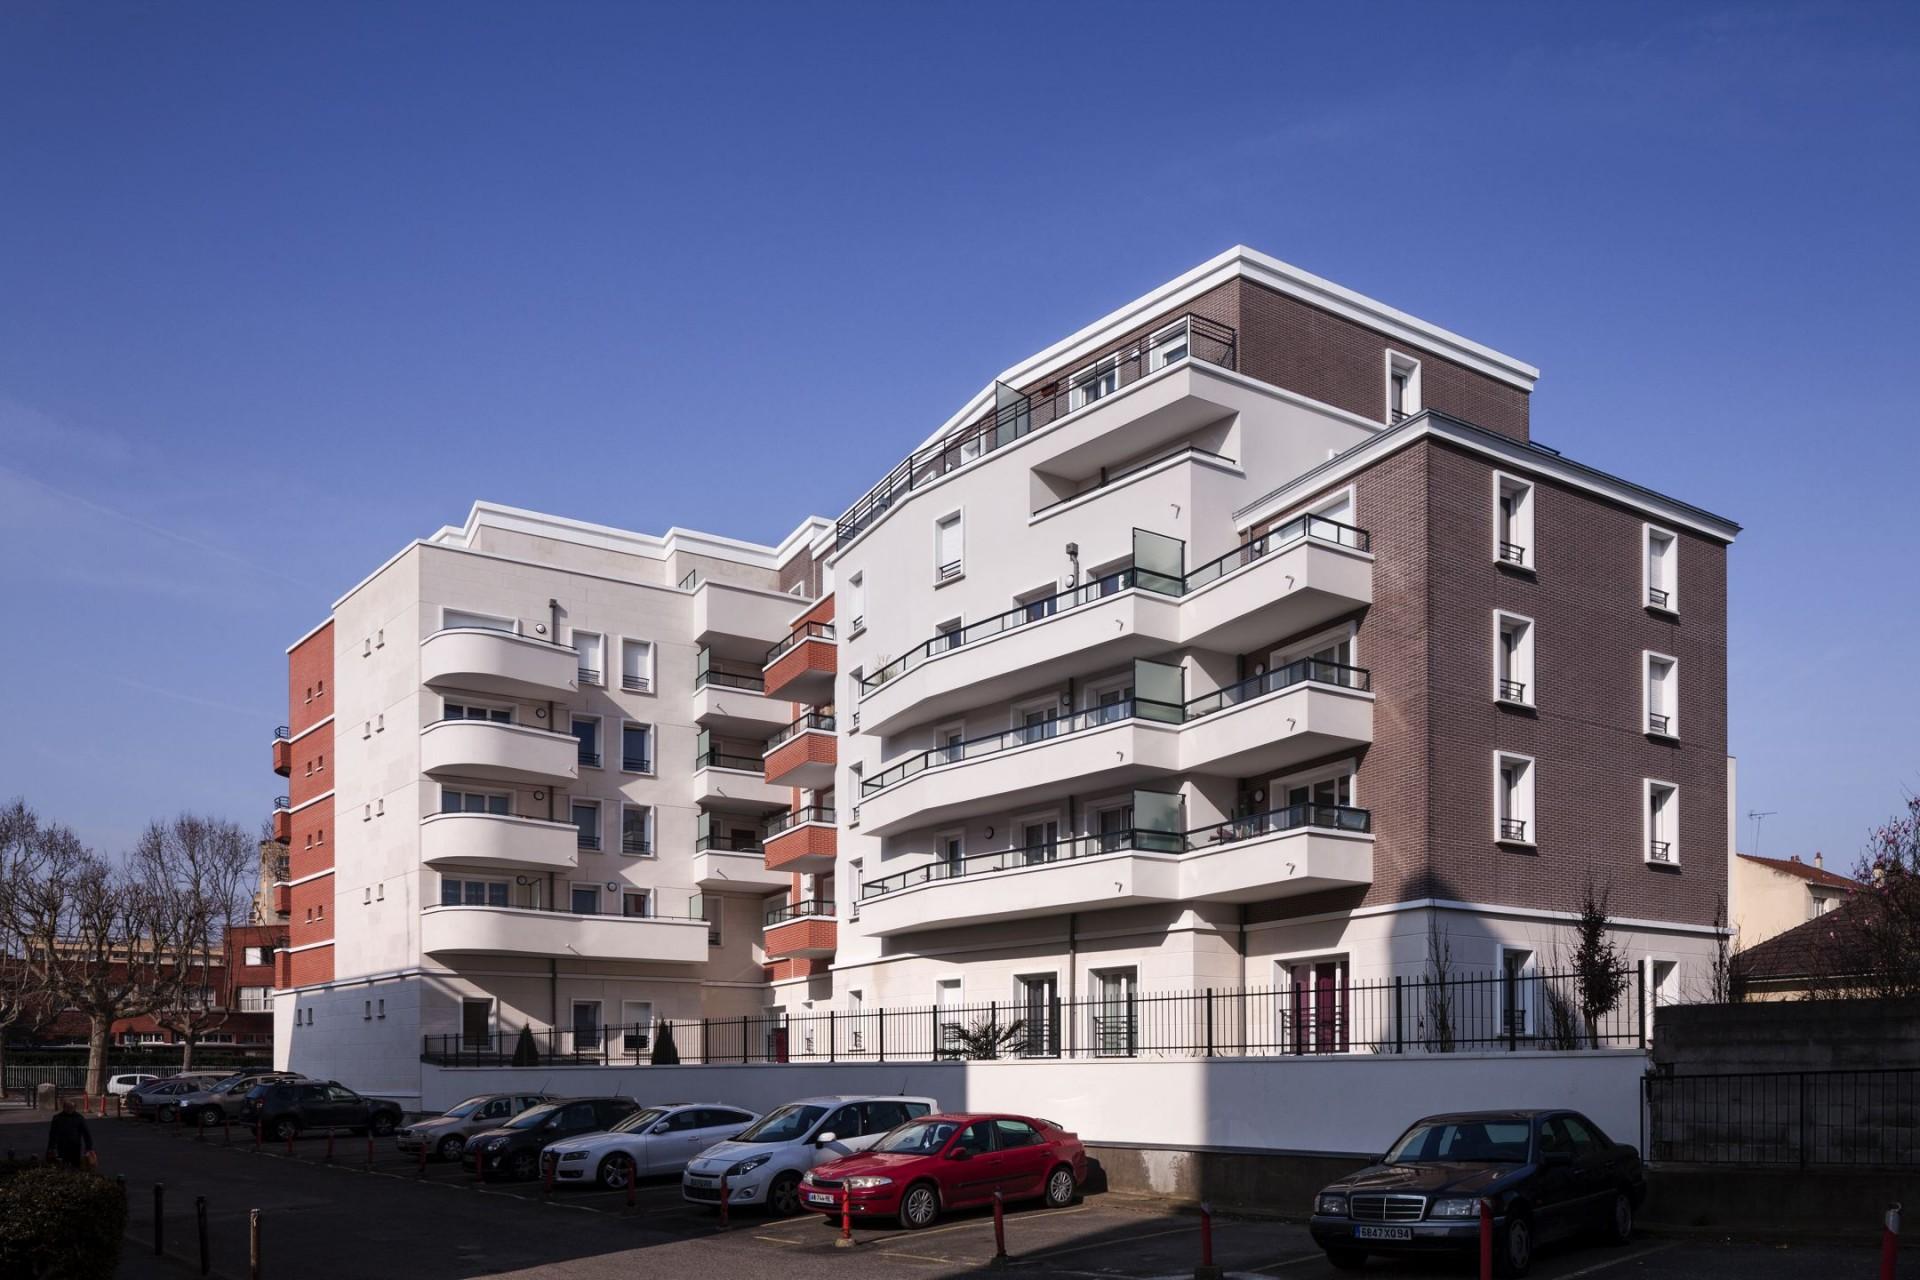 Maisons- Alfort_01